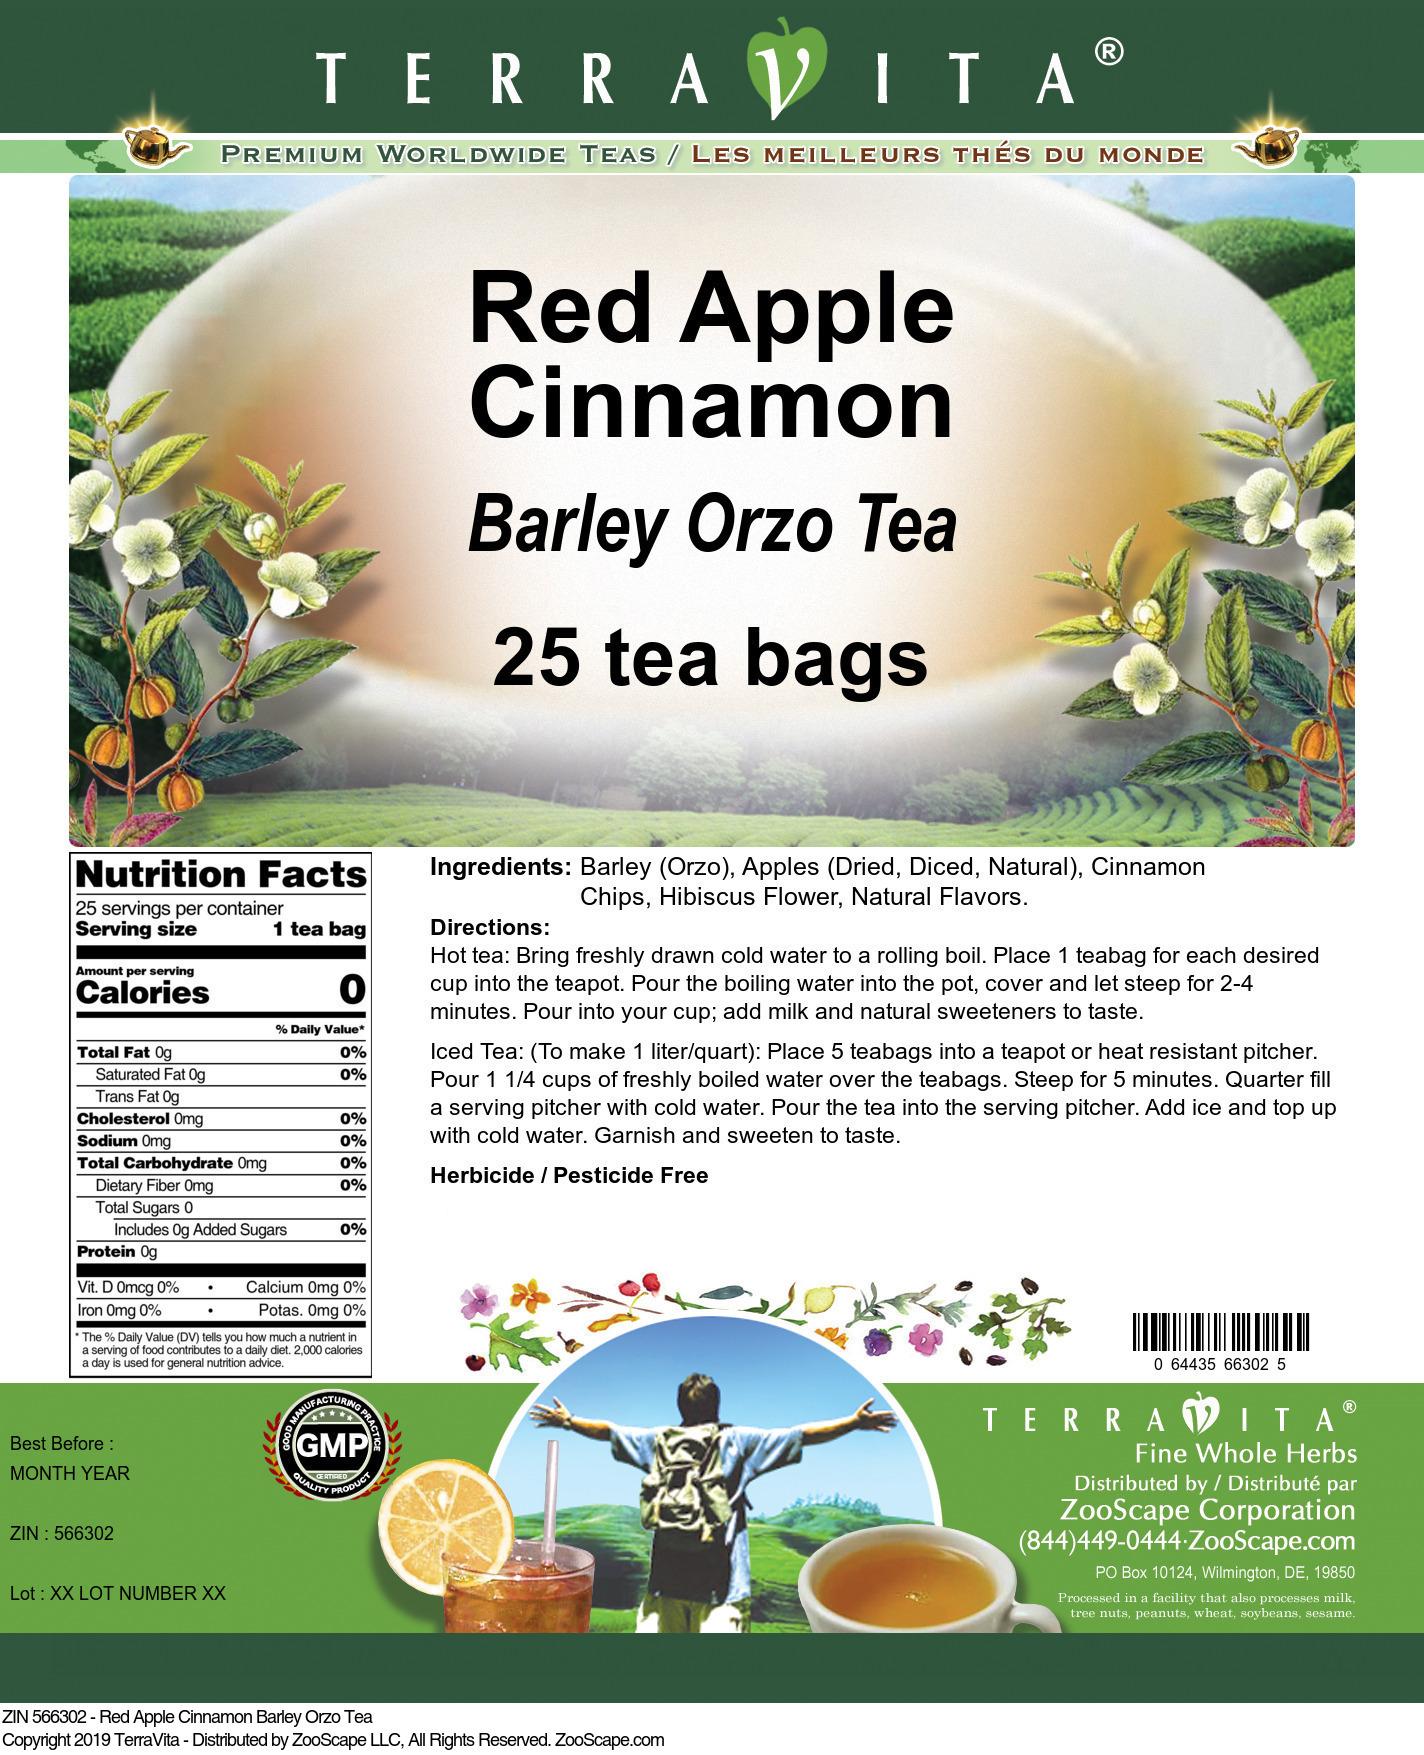 Red Apple Cinnamon Barley Orzo